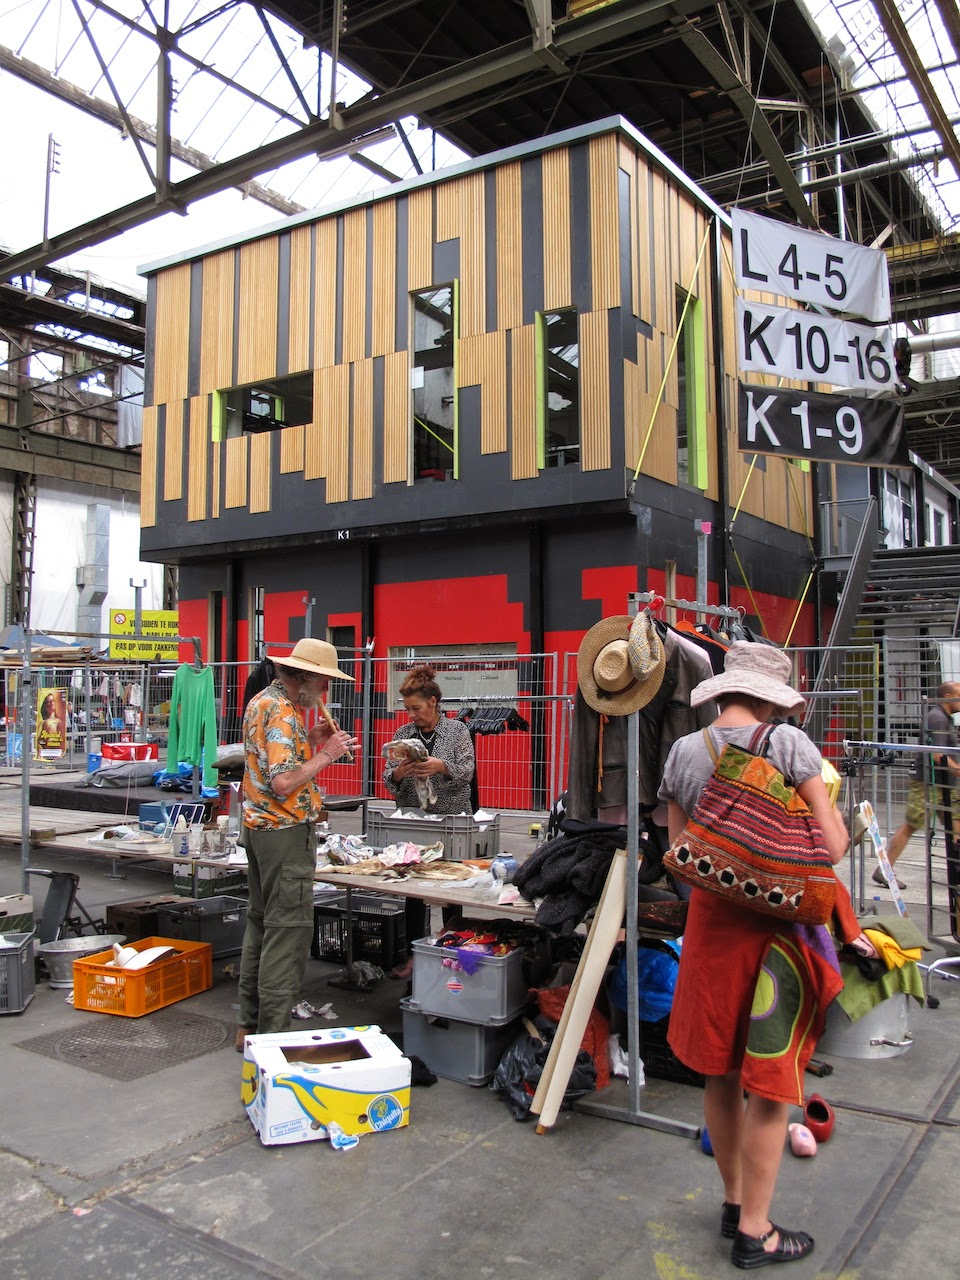 Ij Second hand market, Amsterdam